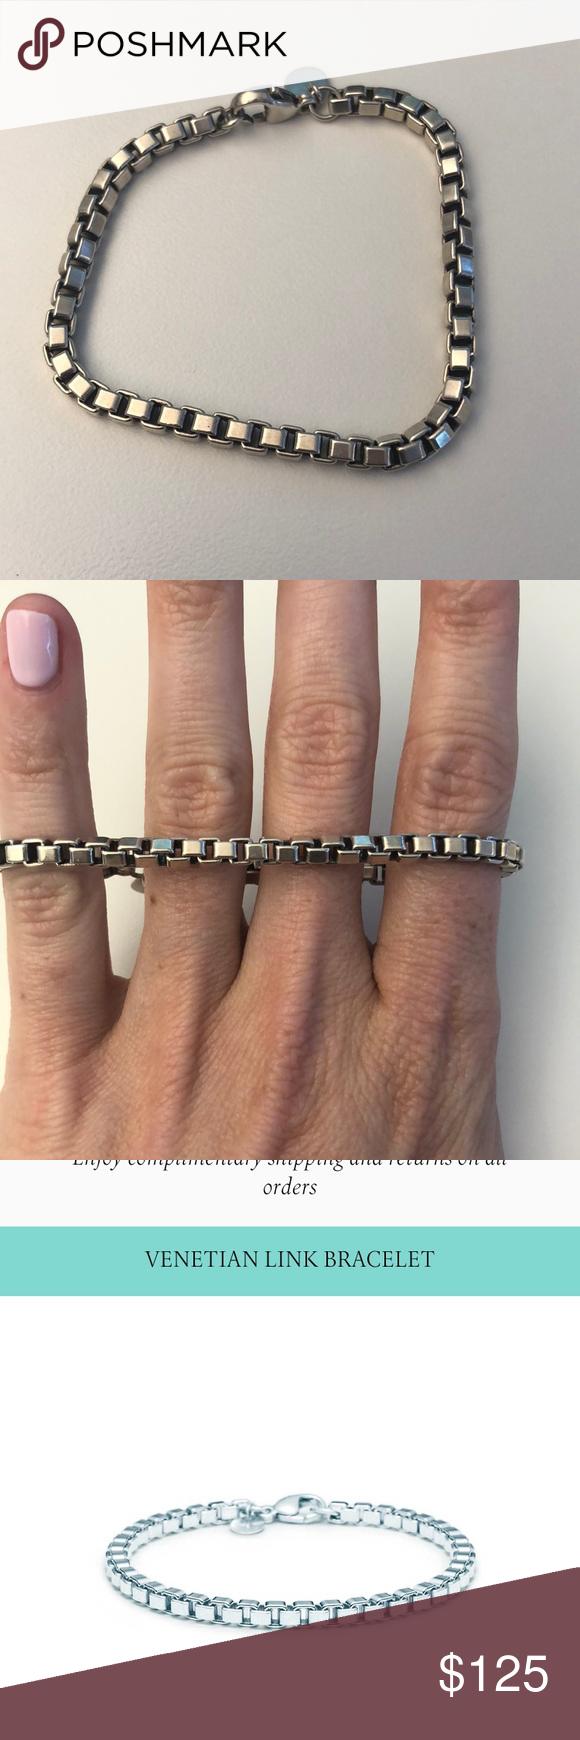 ced4a63dfeec5 tiffany's venetian link bracelet • just got professional cleaned by  tiffany's • sterling silver Tiffany & Co. Jewelry Bracelets